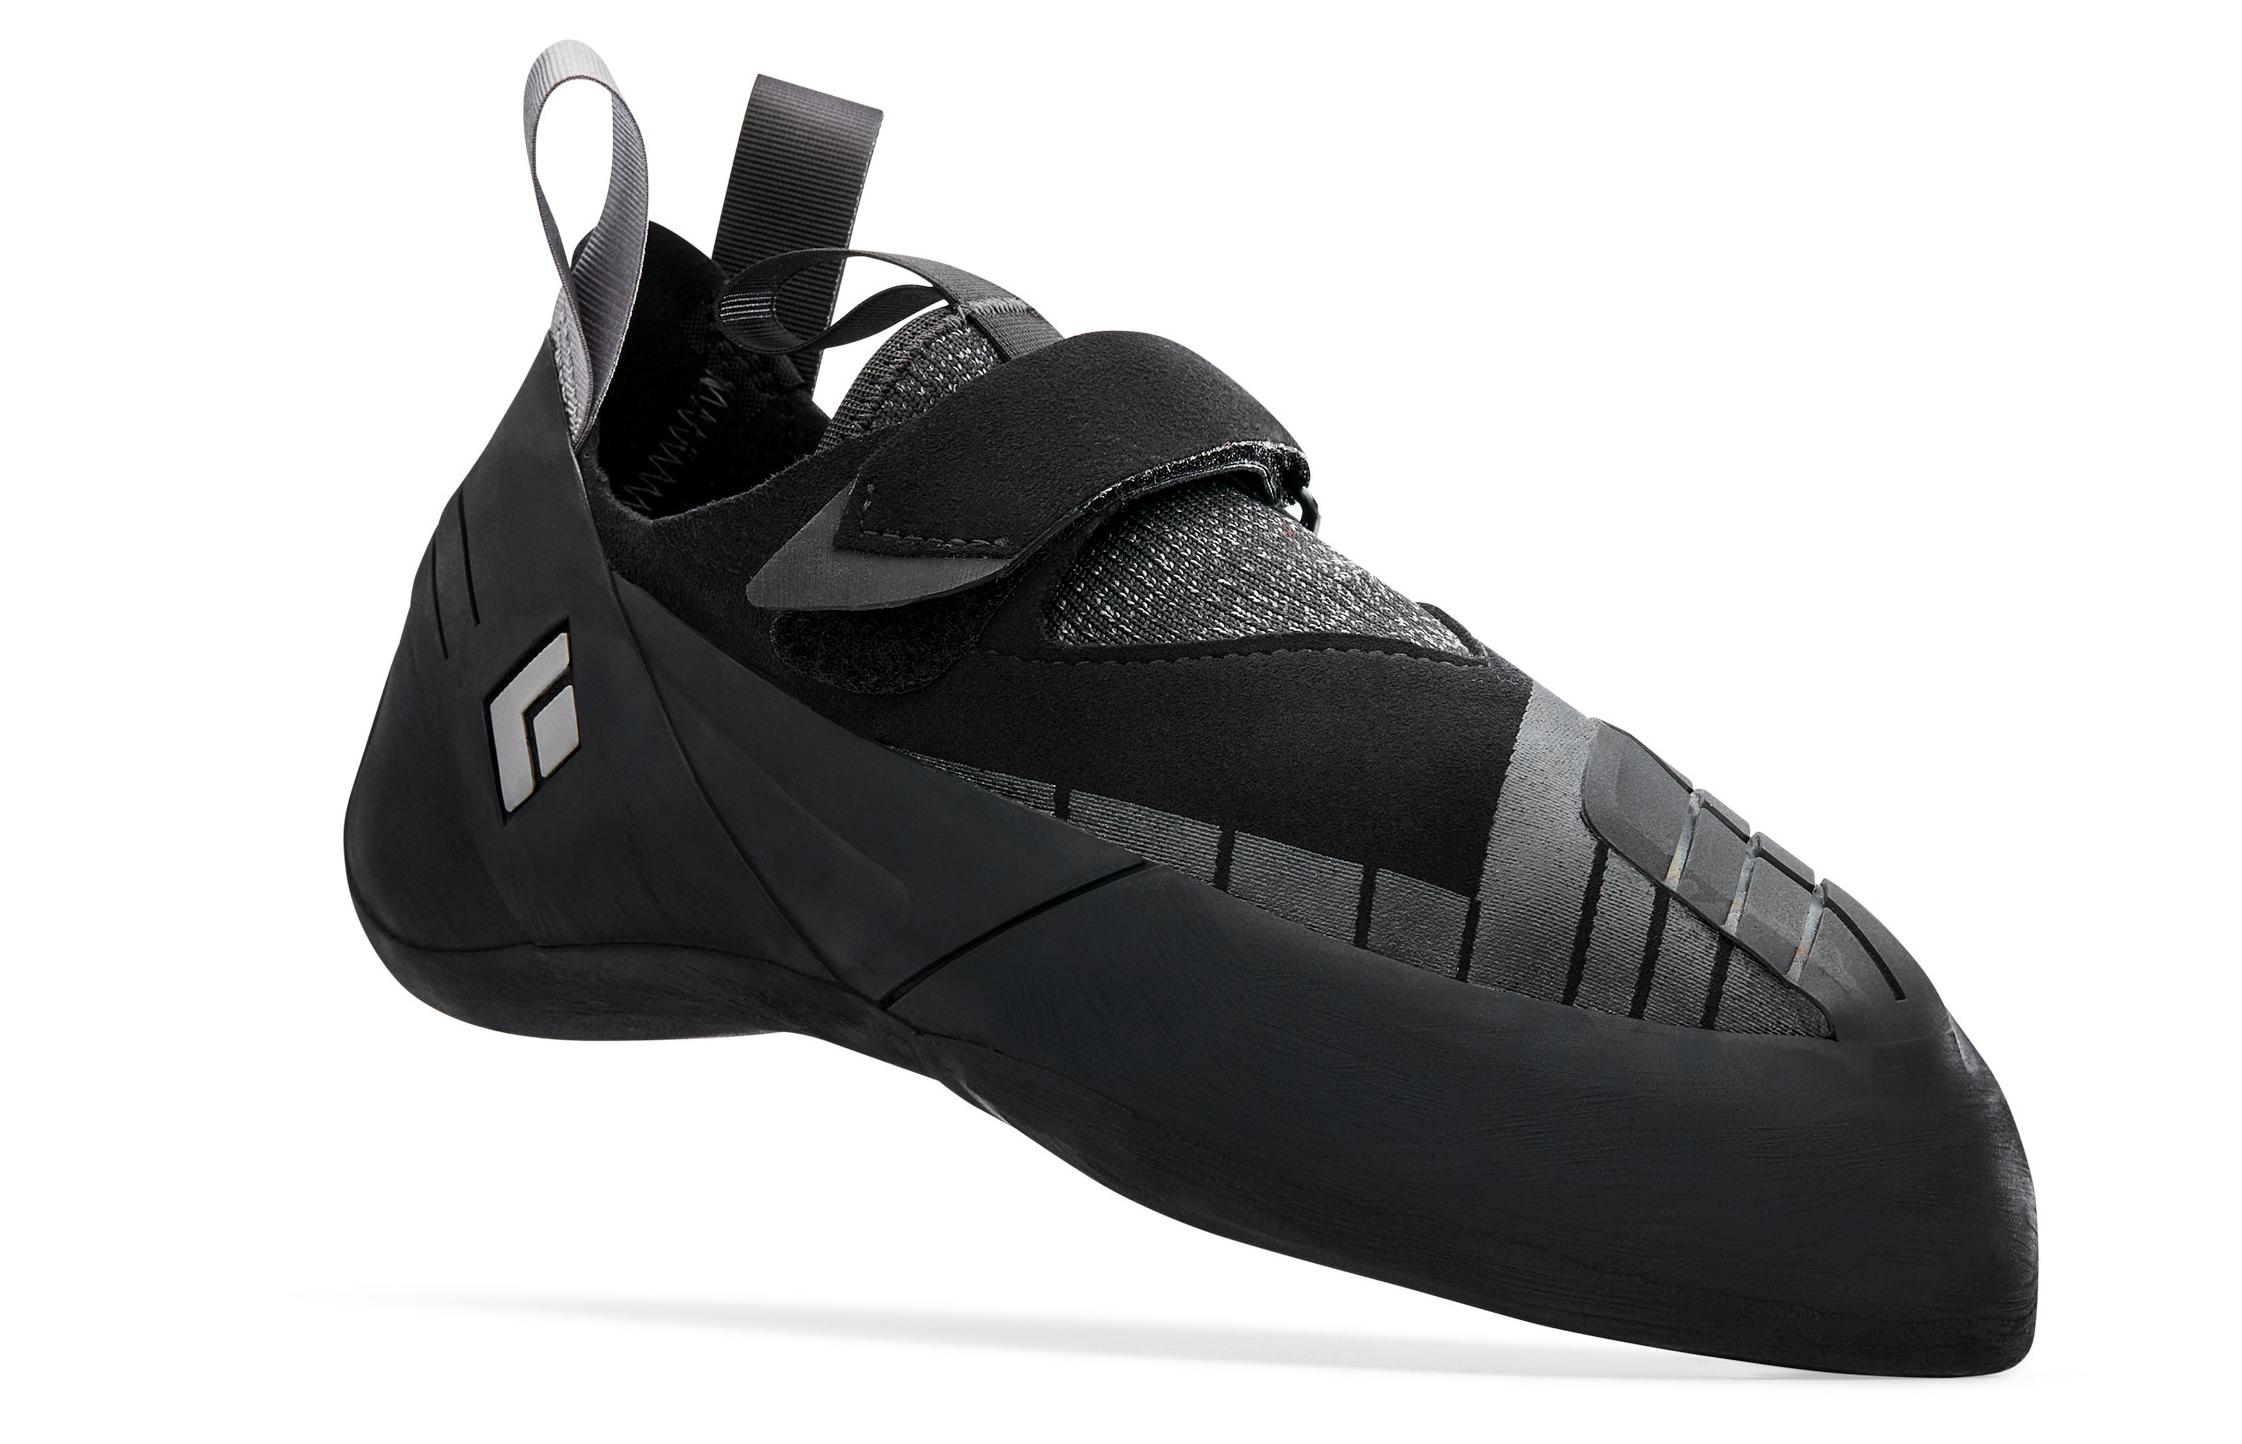 Black Diamond Momentum Shoe Review